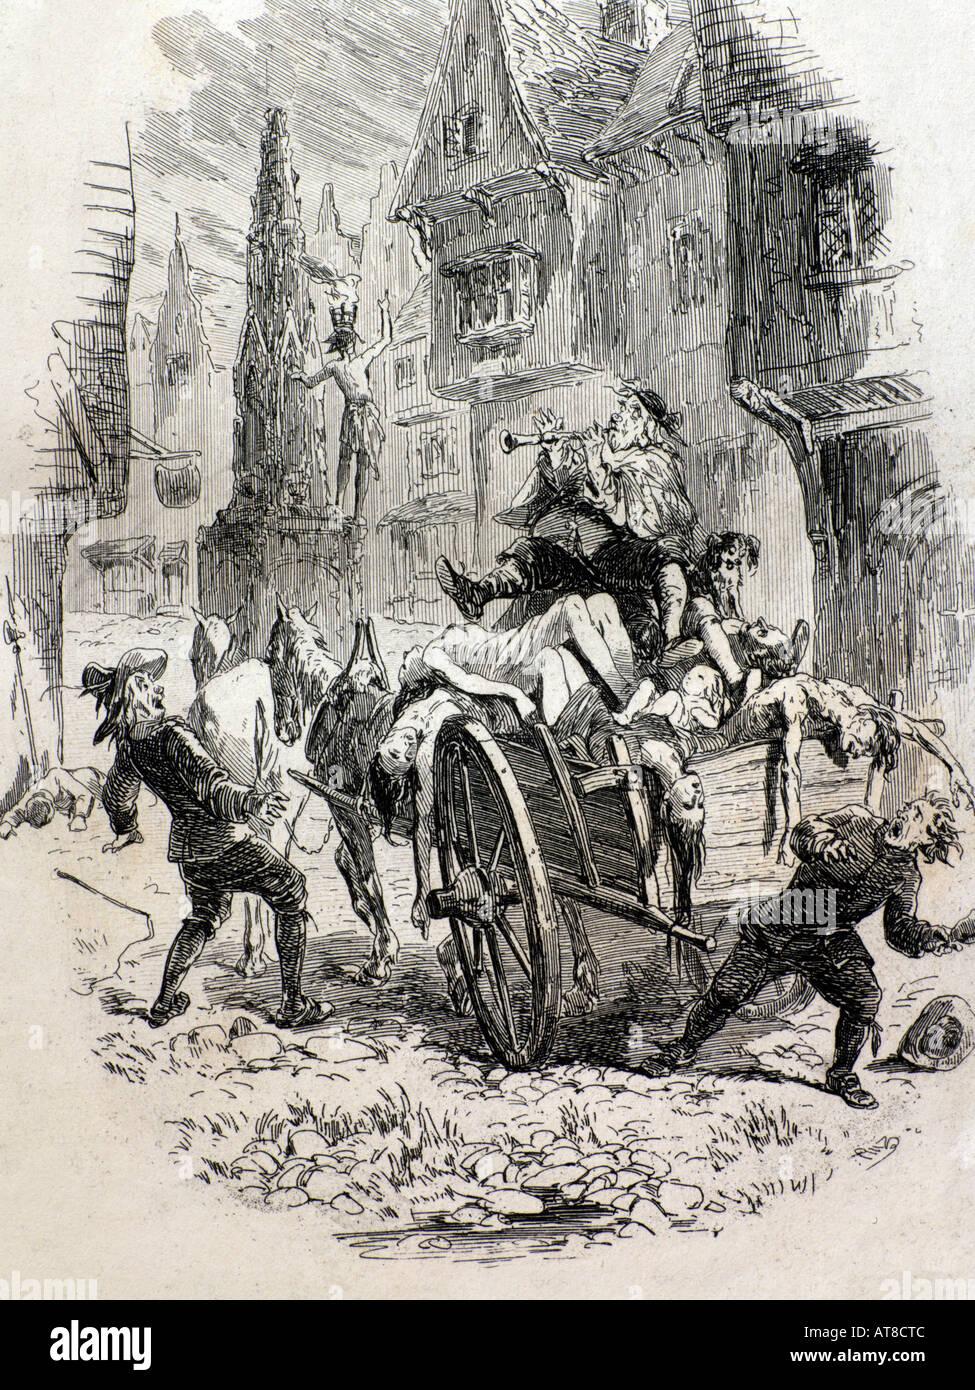 Holzschnitt Pest Court Black Death London England 1347-1350